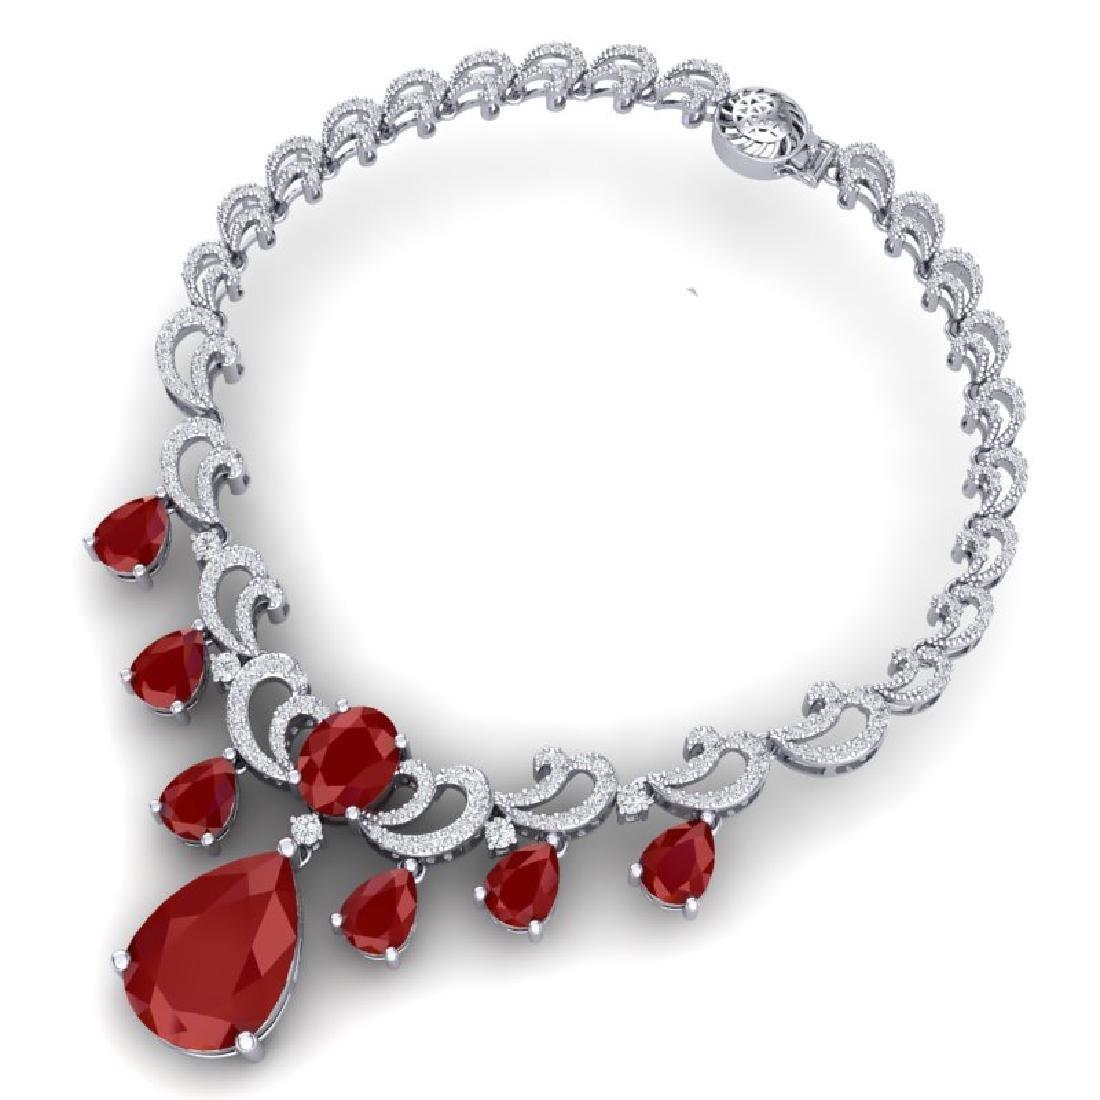 36.85 CTW Royalty Ruby & VS Diamond Necklace 18K White - 3